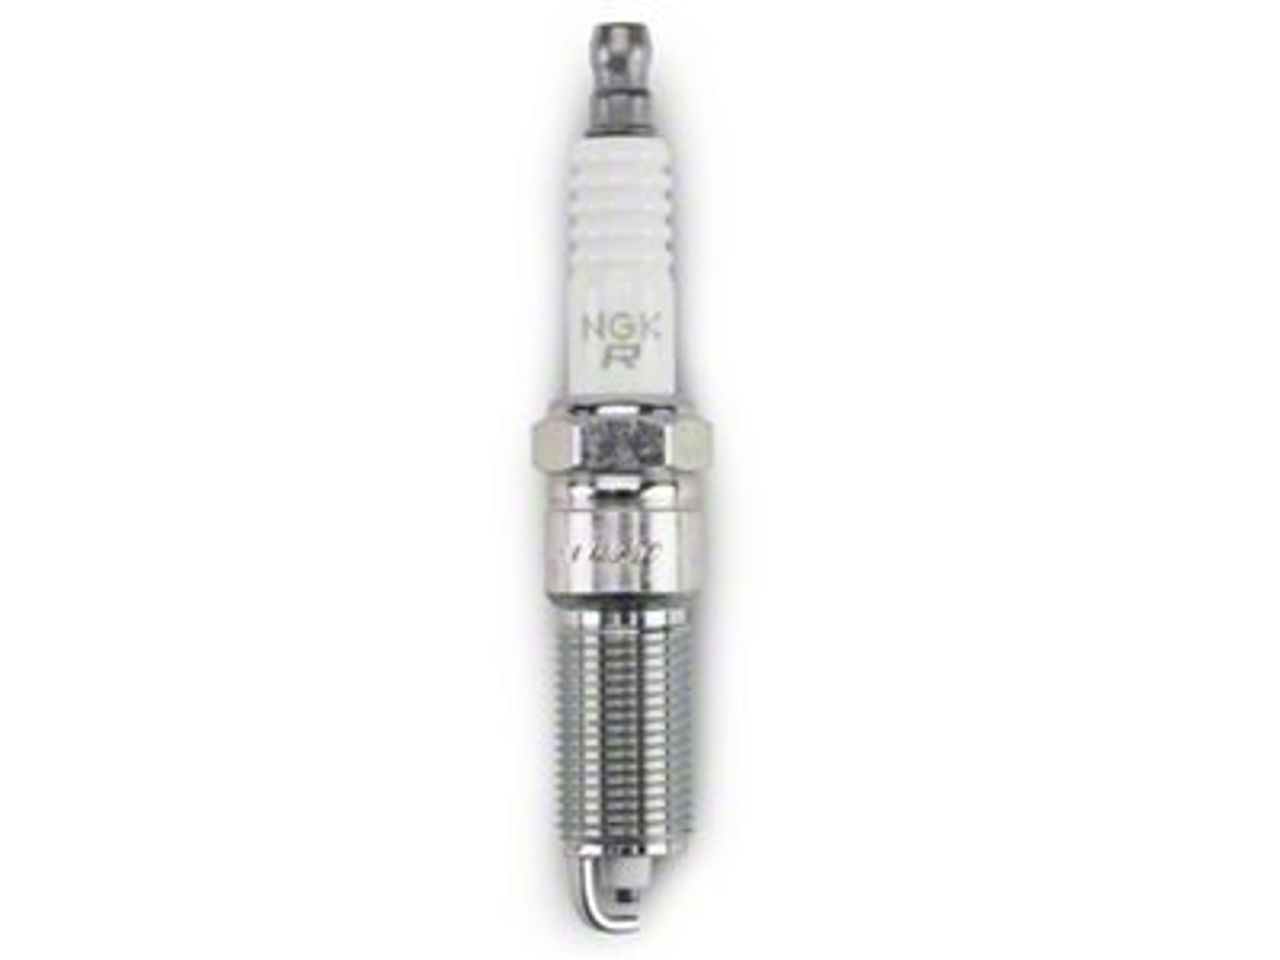 NGK V-Power Spark Plug - 3.8L (07-11 Jeep Wrangler JK)